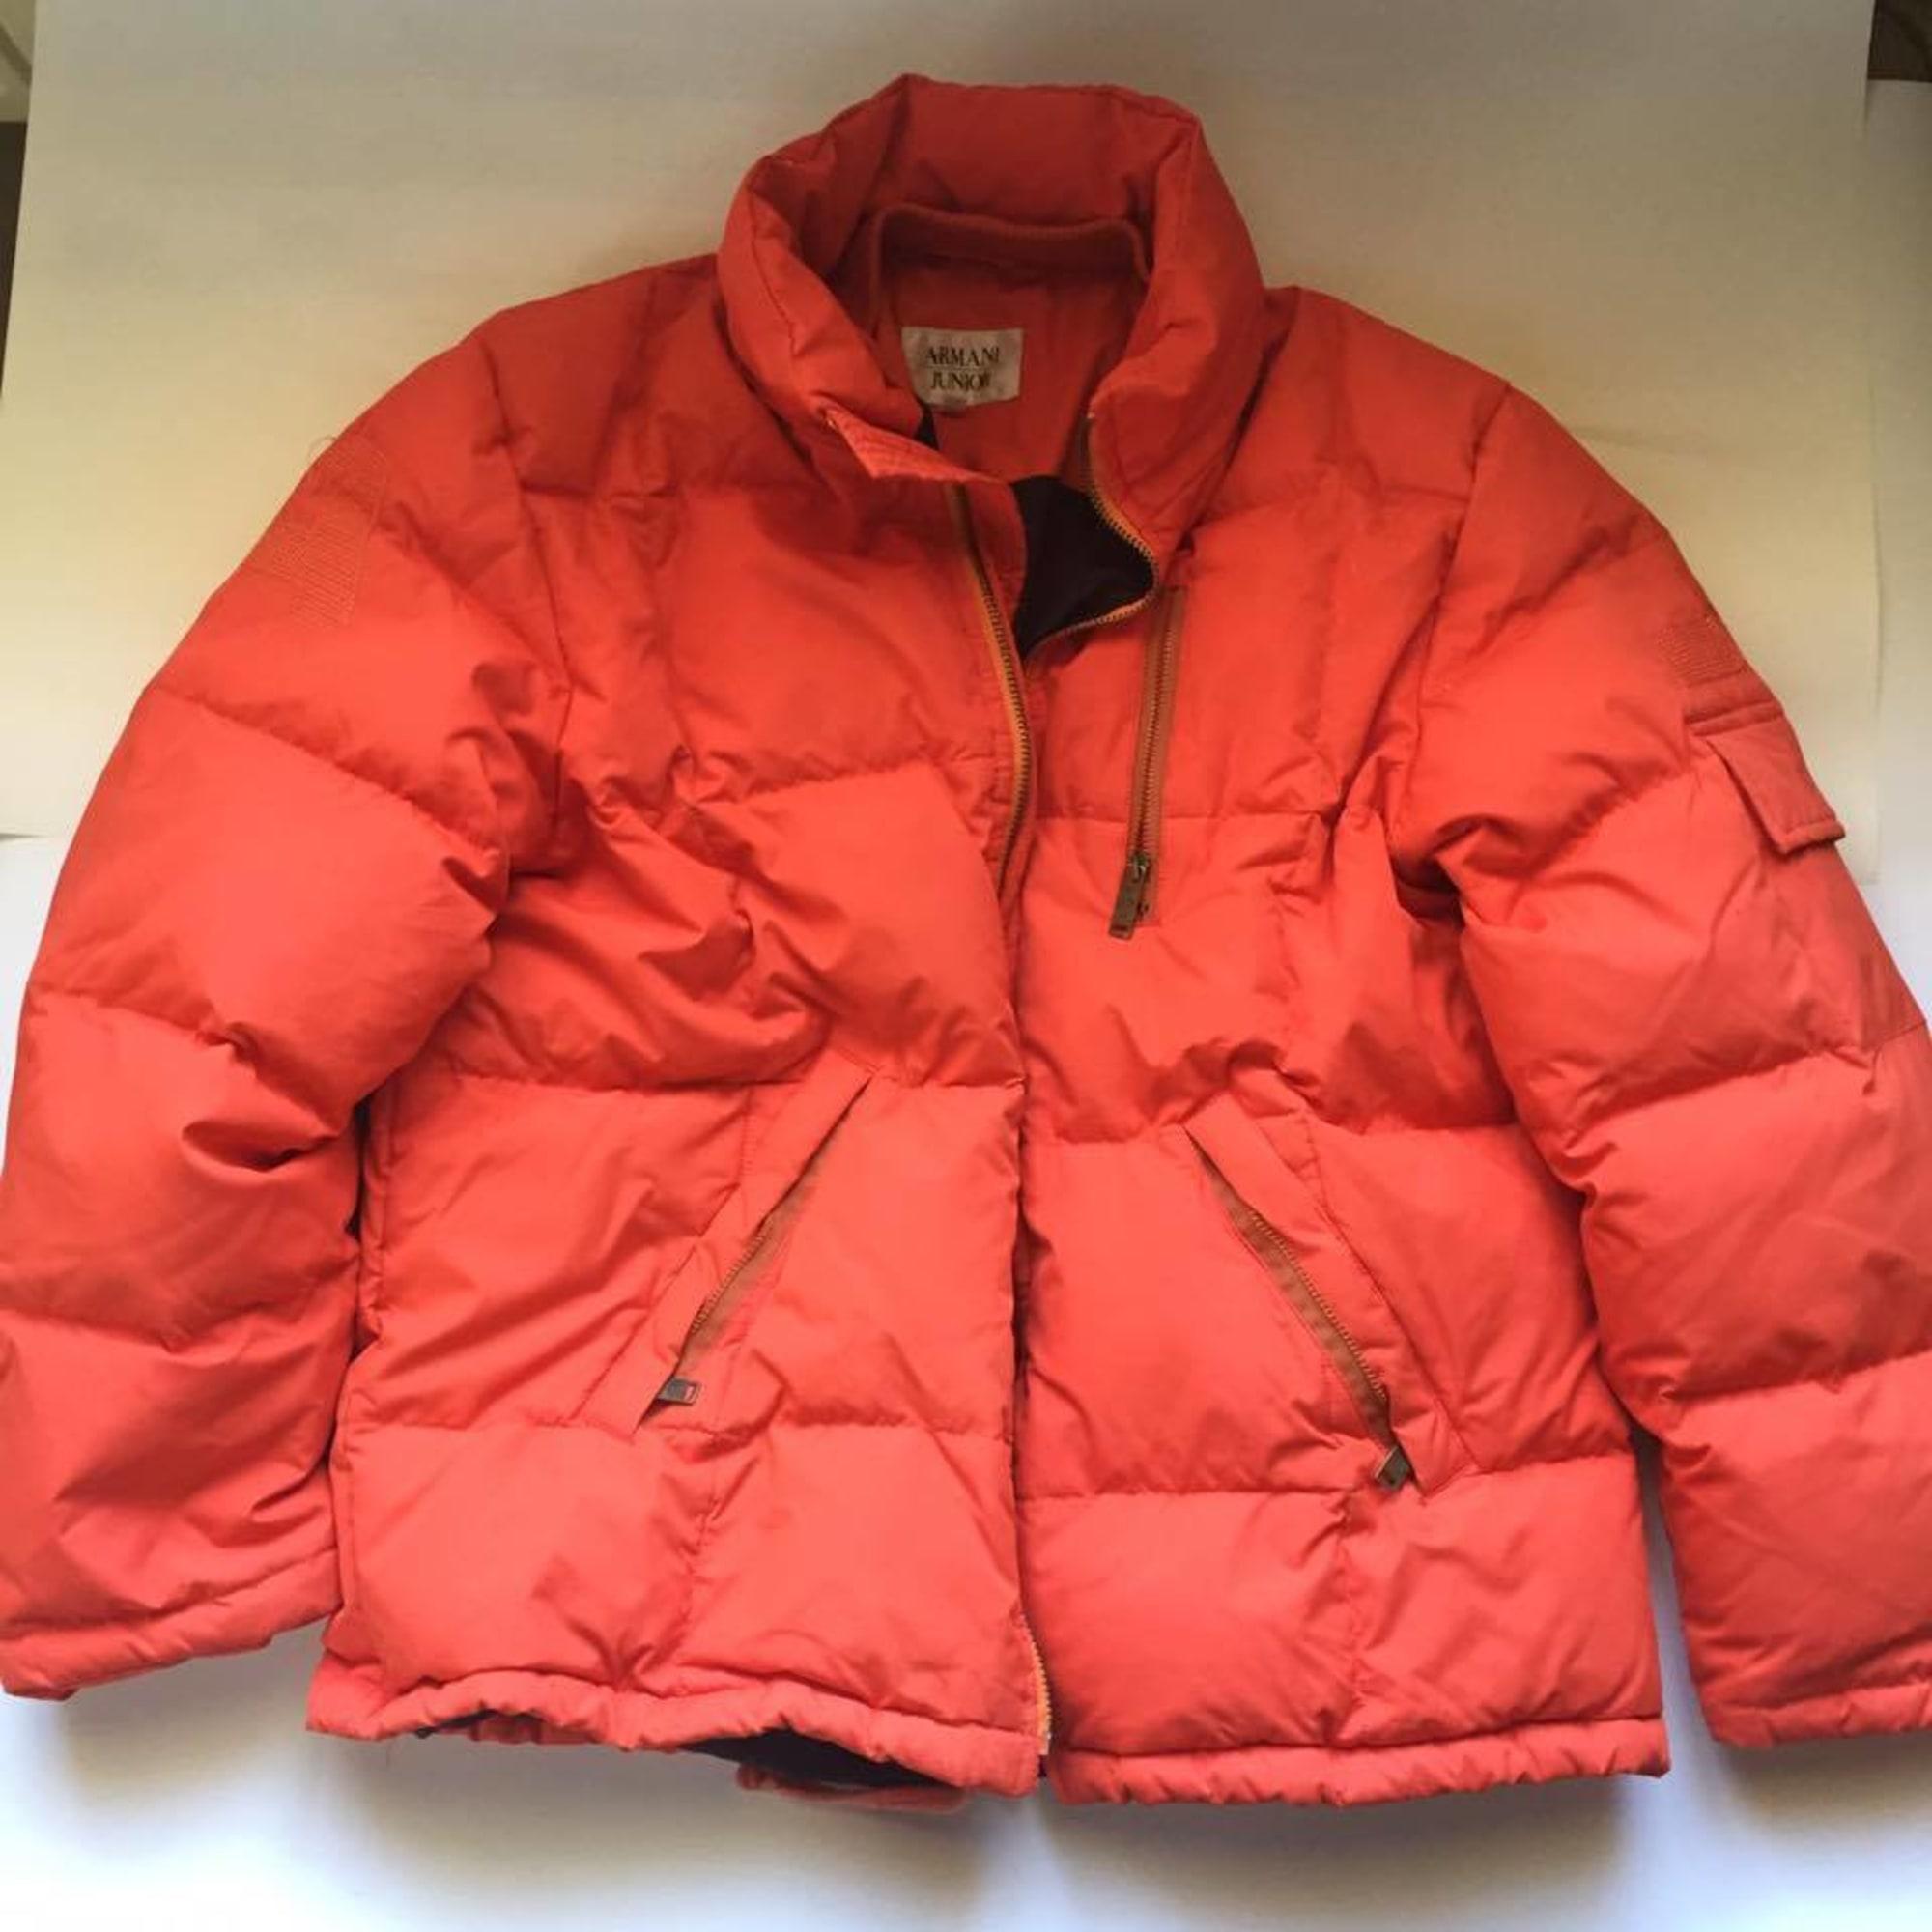 b6083b0e87f Doudoune ARMANI JUNIOR 11-12 ans orange vendu par Adbruges - 6814404